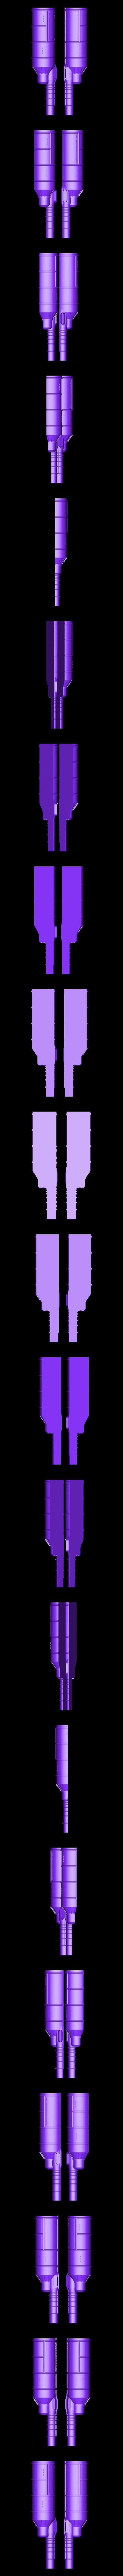 DaeHull.stl Download free STL file Daedalus Class (Star Trek) • 3D printable object, anotherthing